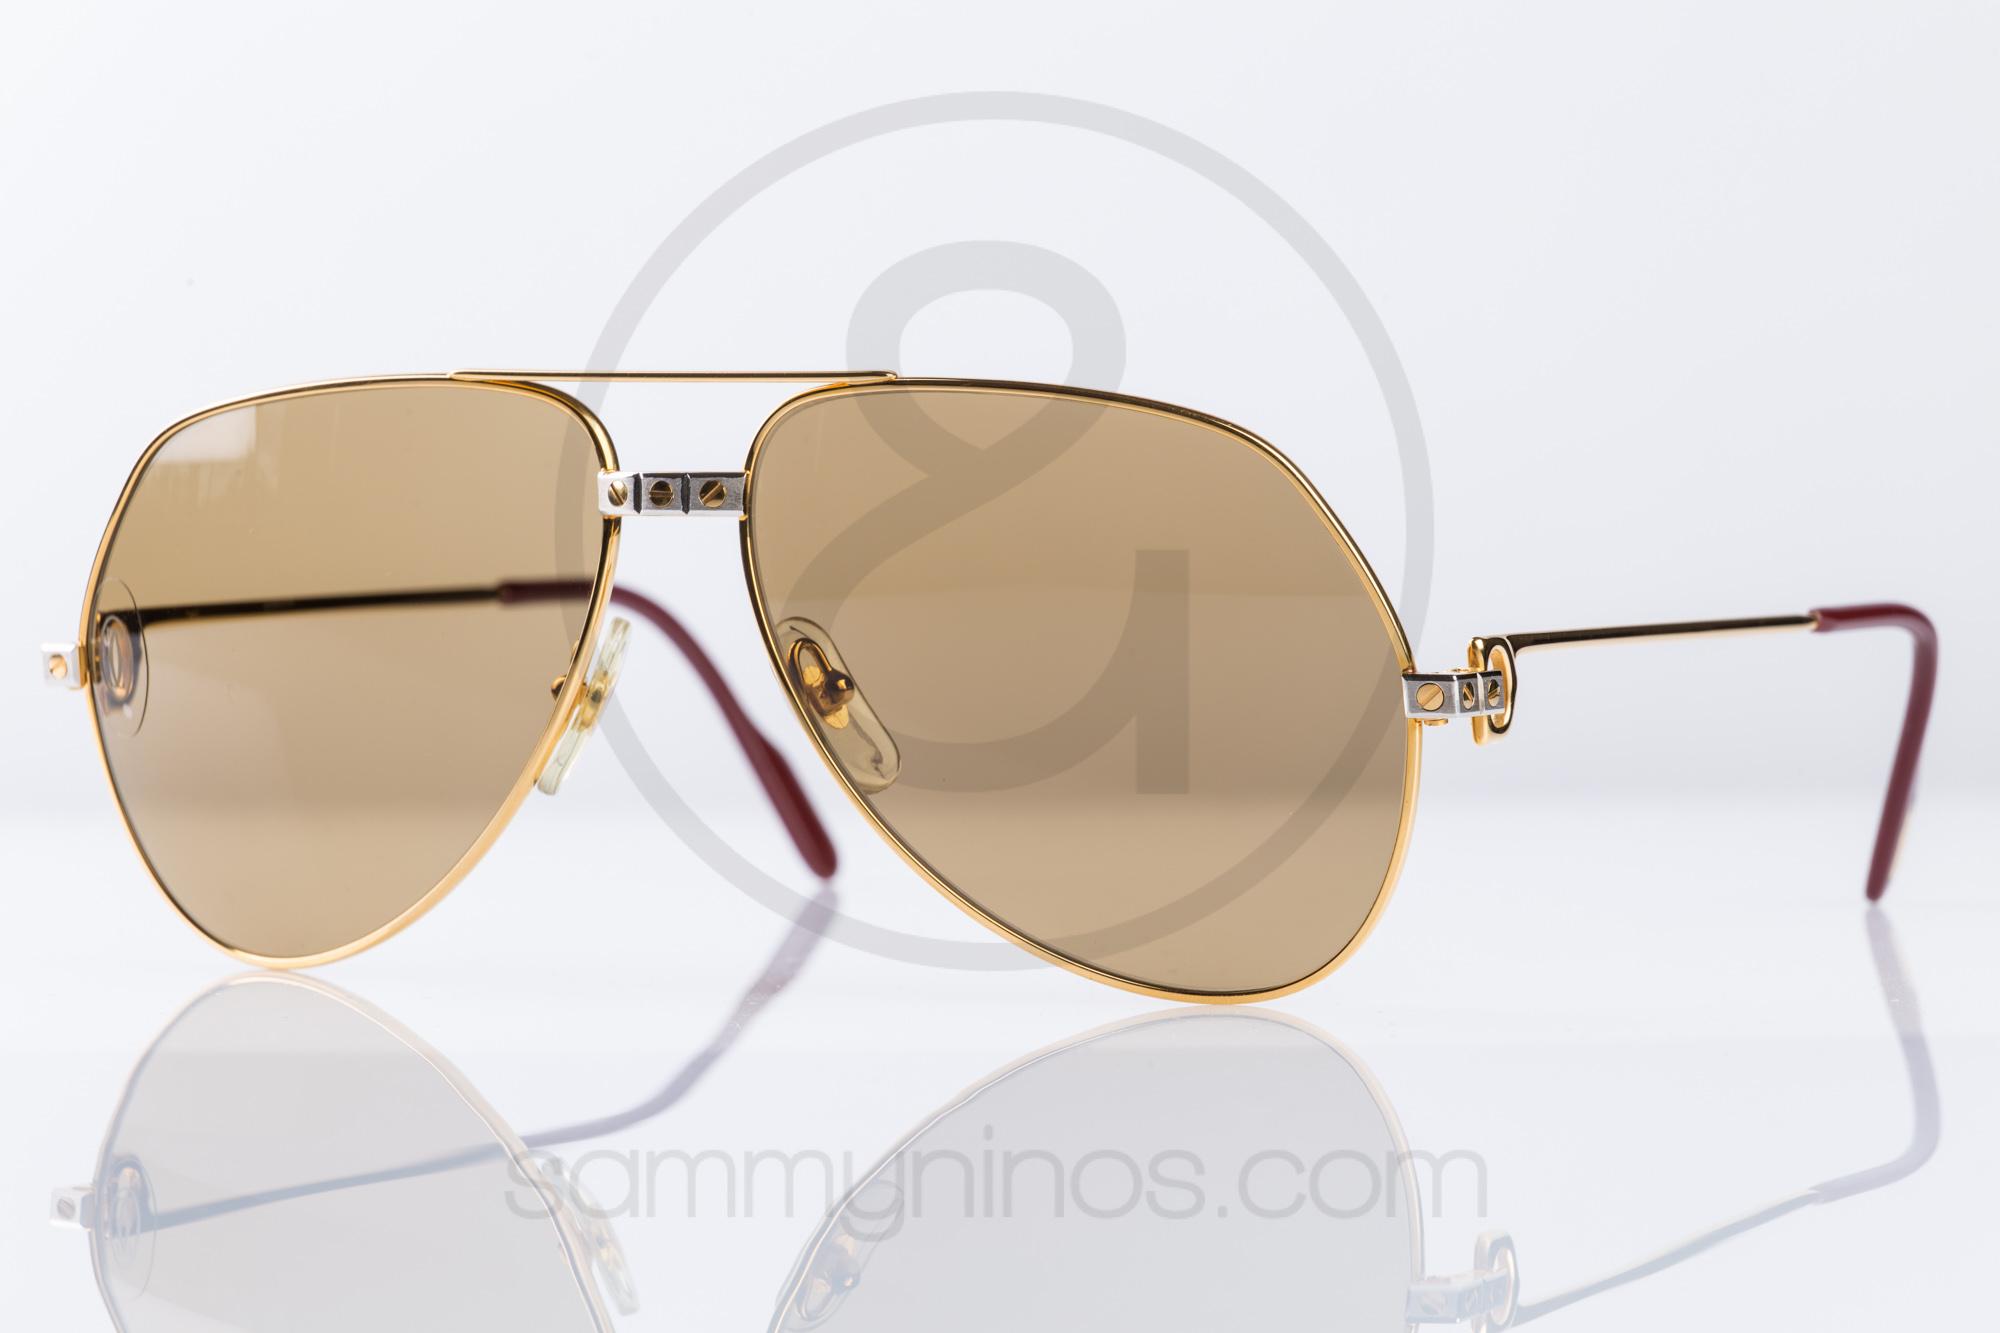 958c4ec25e78 Previous  Next. HomeSOLD OUTCartier Vendome Santos 62-14